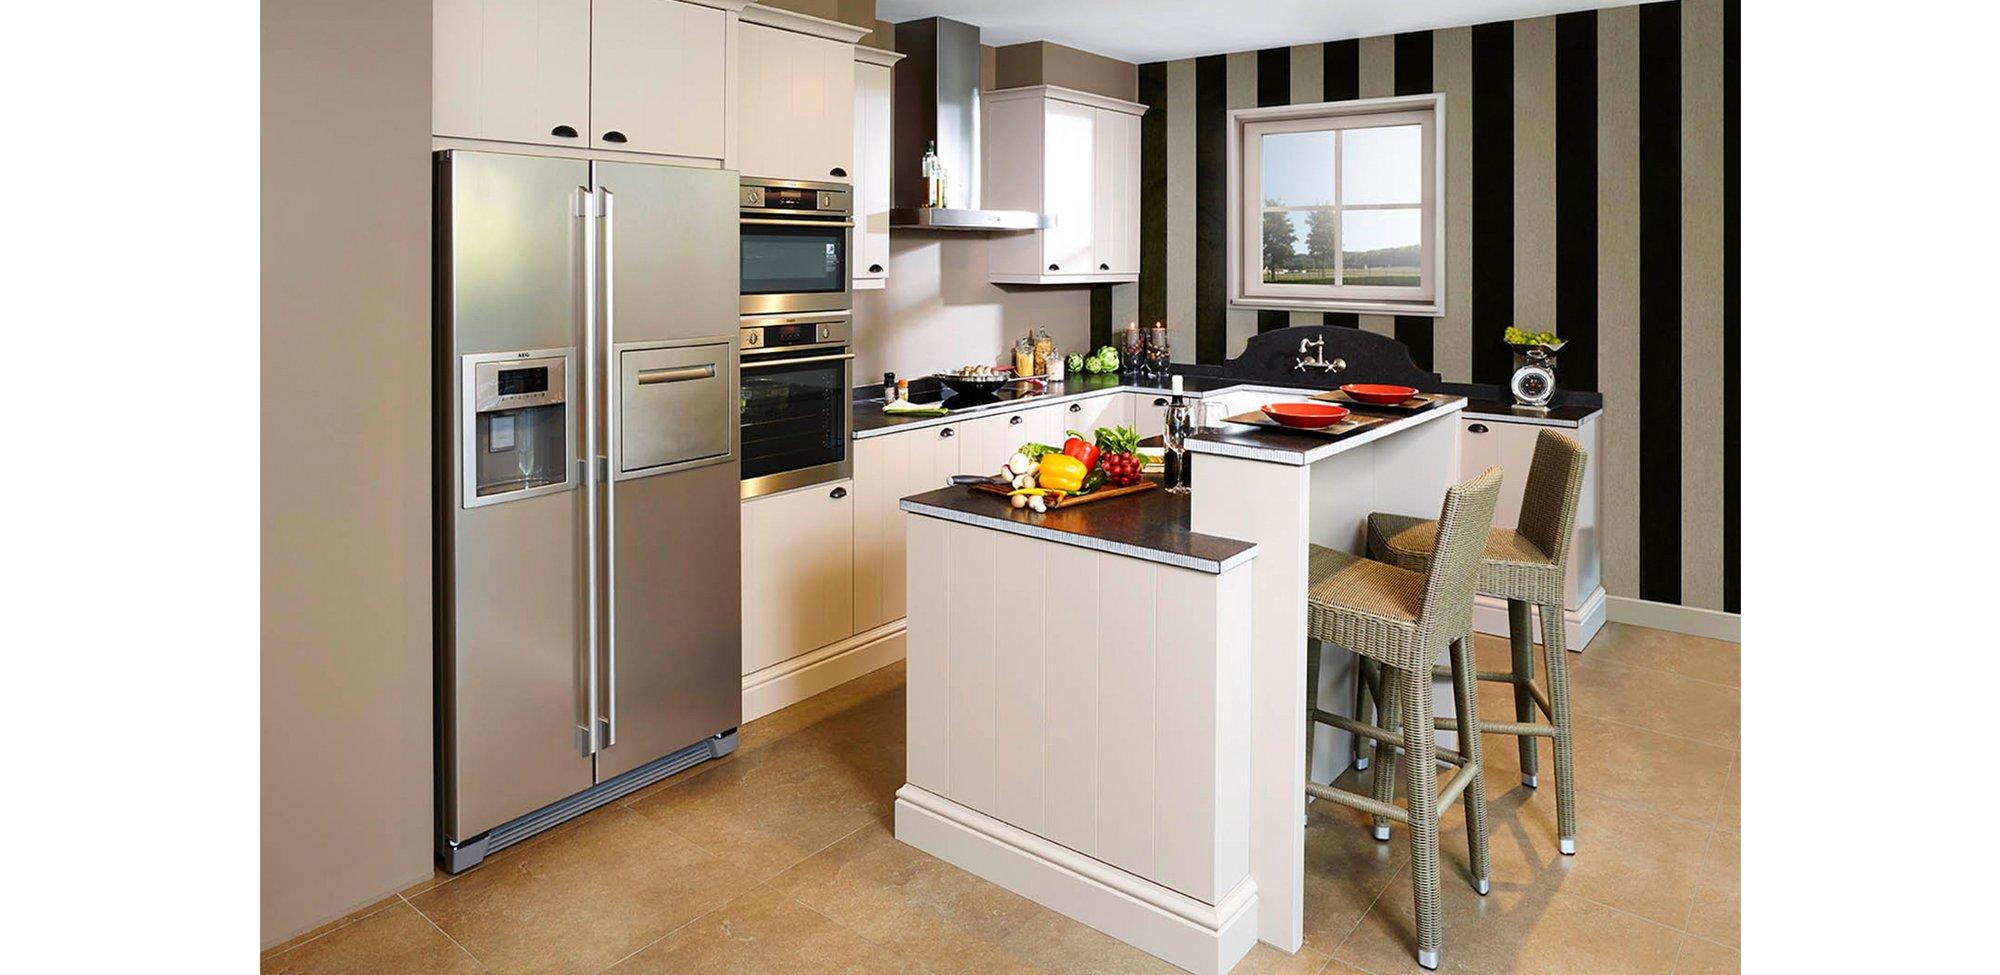 Landelijke zandkleurige keuken - Model Geneve